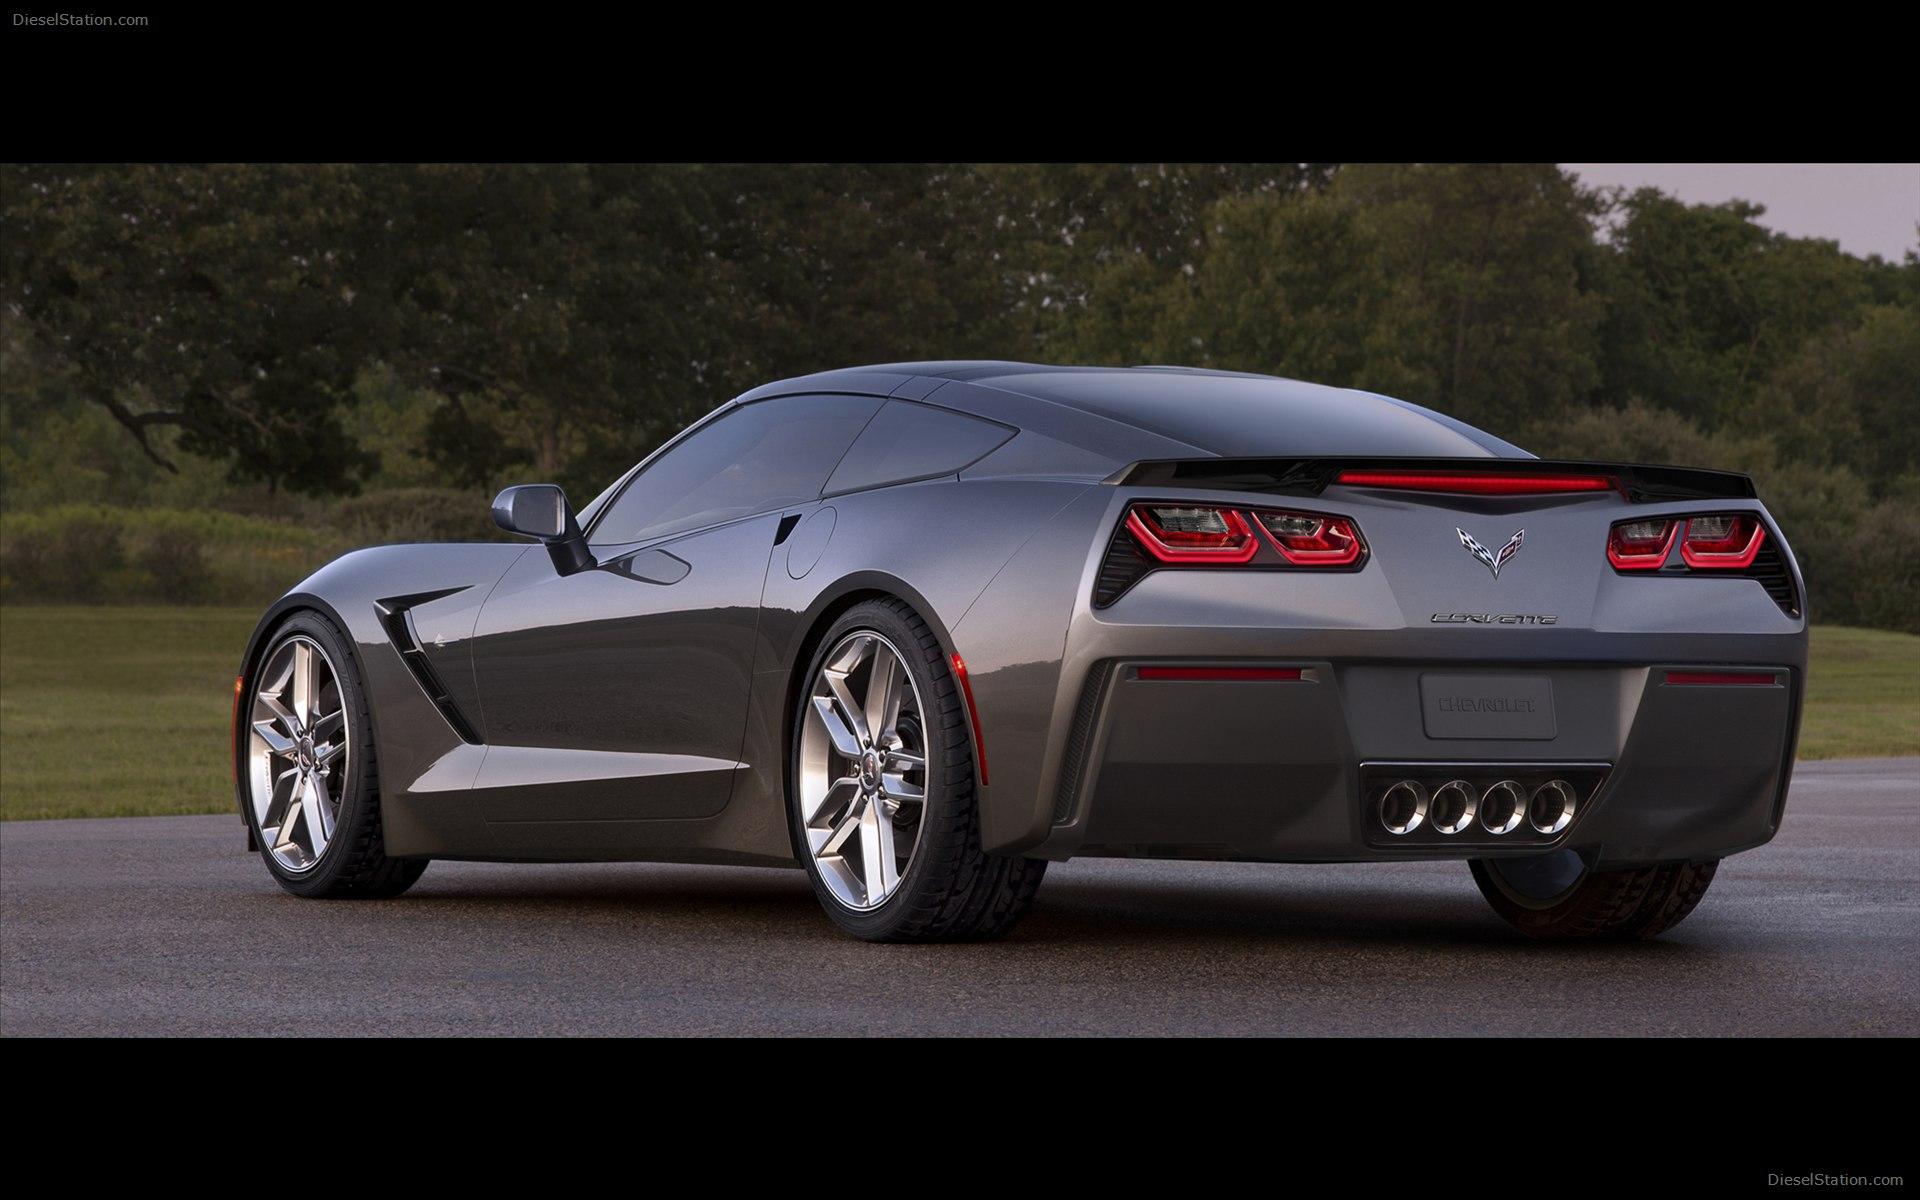 Chevy corvette c7 2014 Chevrolet Corvette C7 Stingray 1920x1200